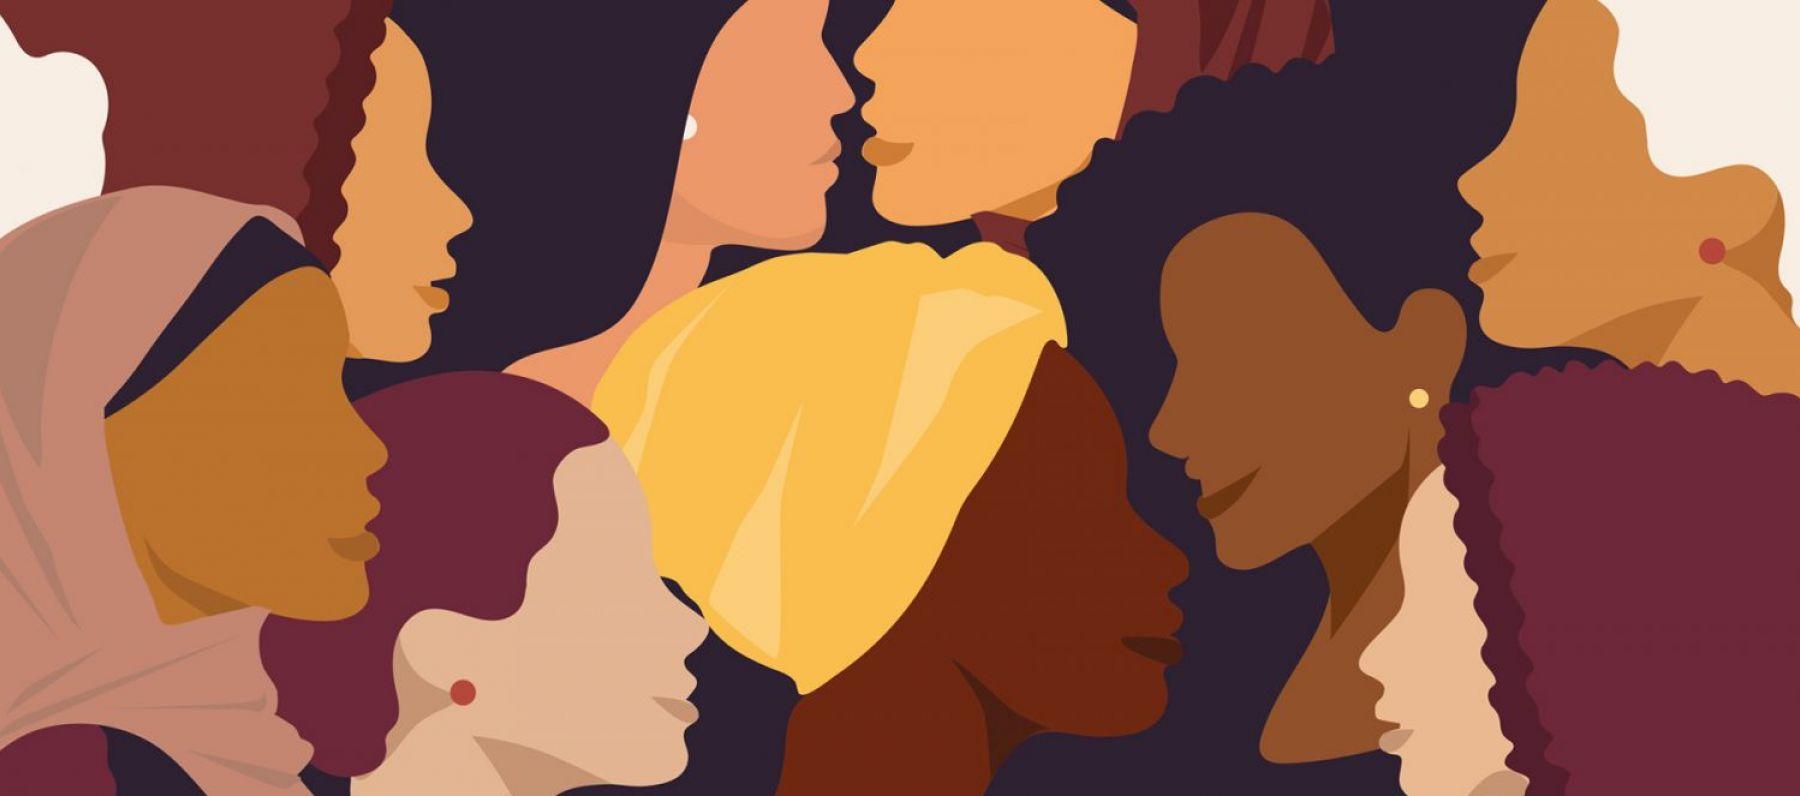 User Research Consumer Intelligence Nigerian women Menstrual Hygiene